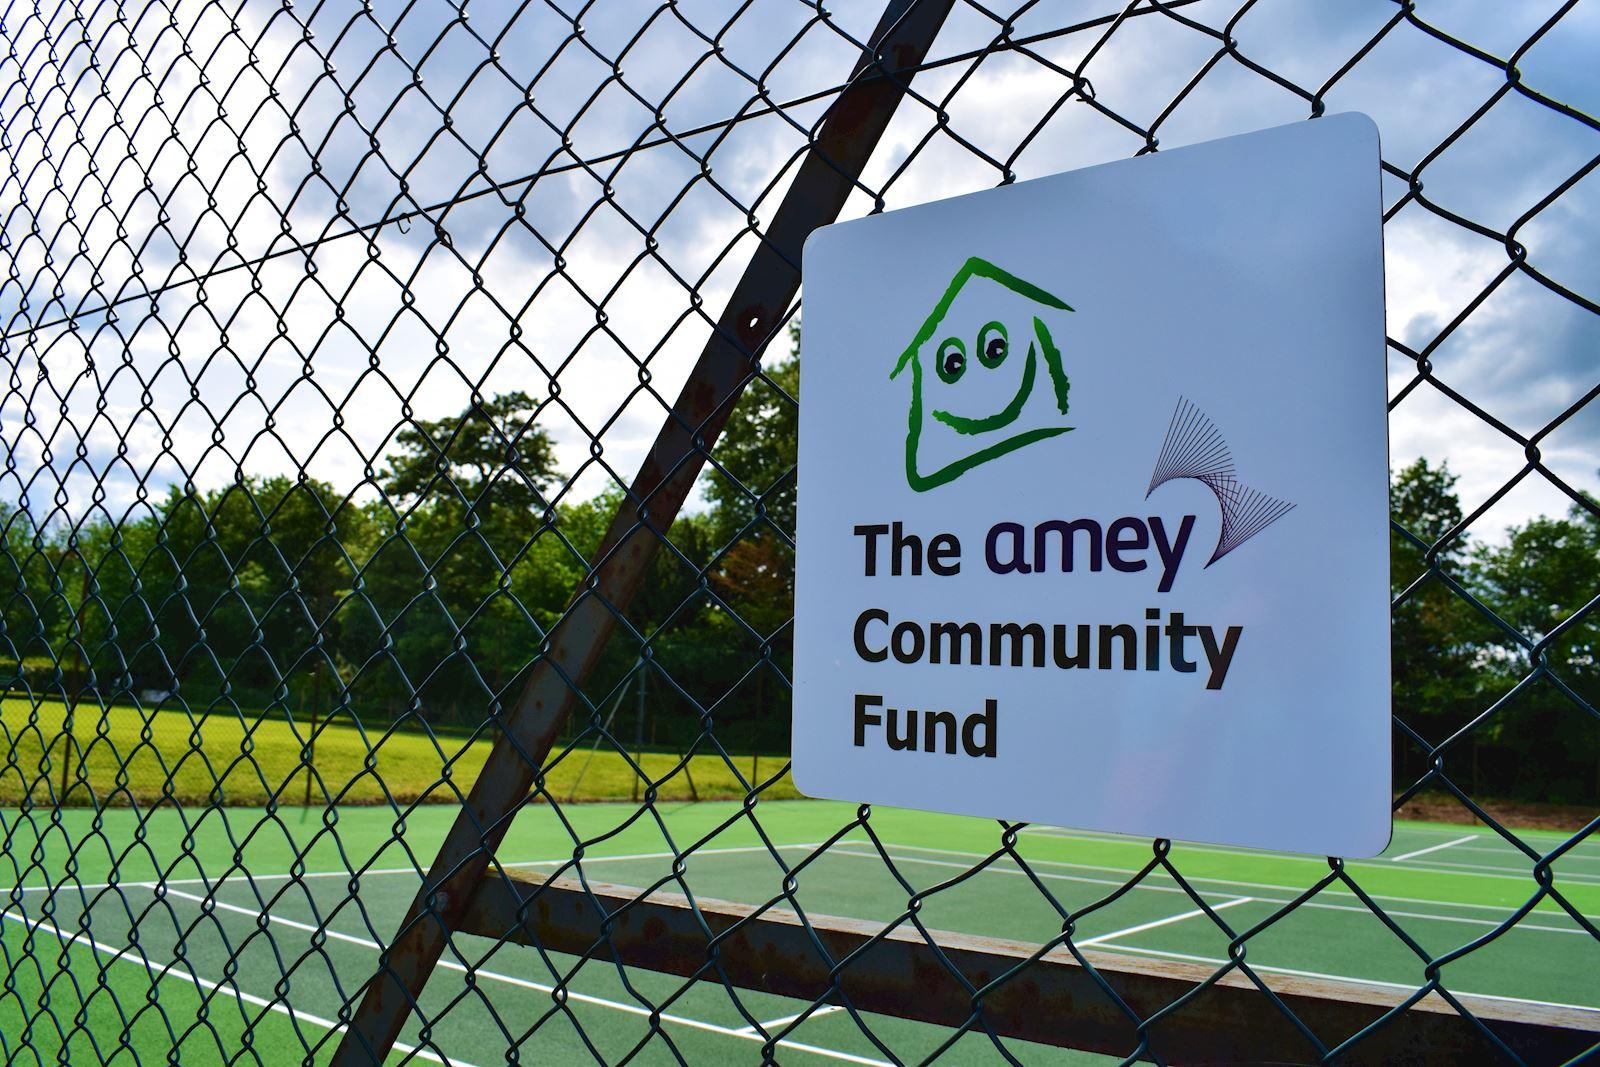 Amey Community Fund